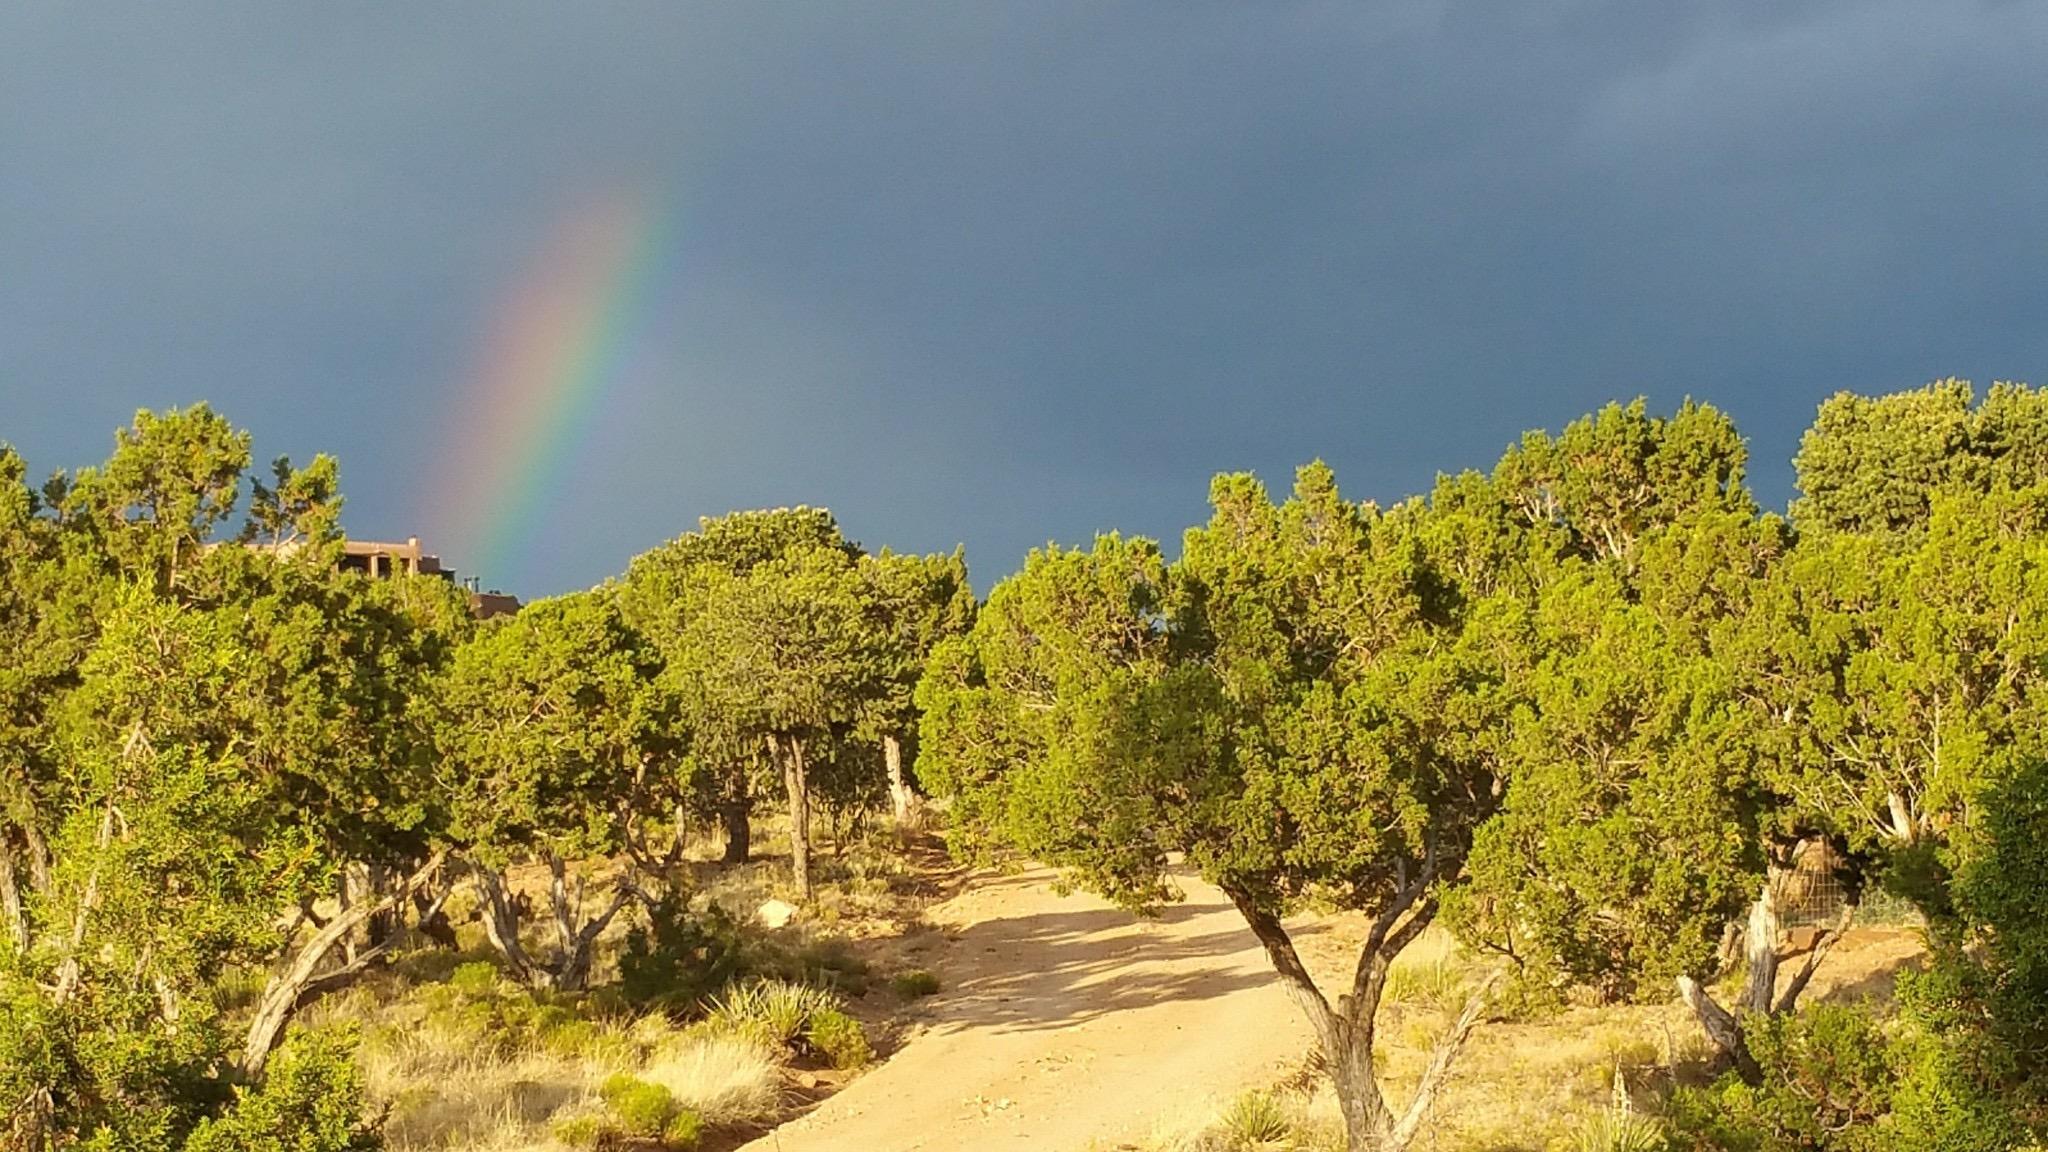 86 ARROYO HONDO Road #A, Santa Fe, NM 87508 - Santa Fe, NM real estate listing